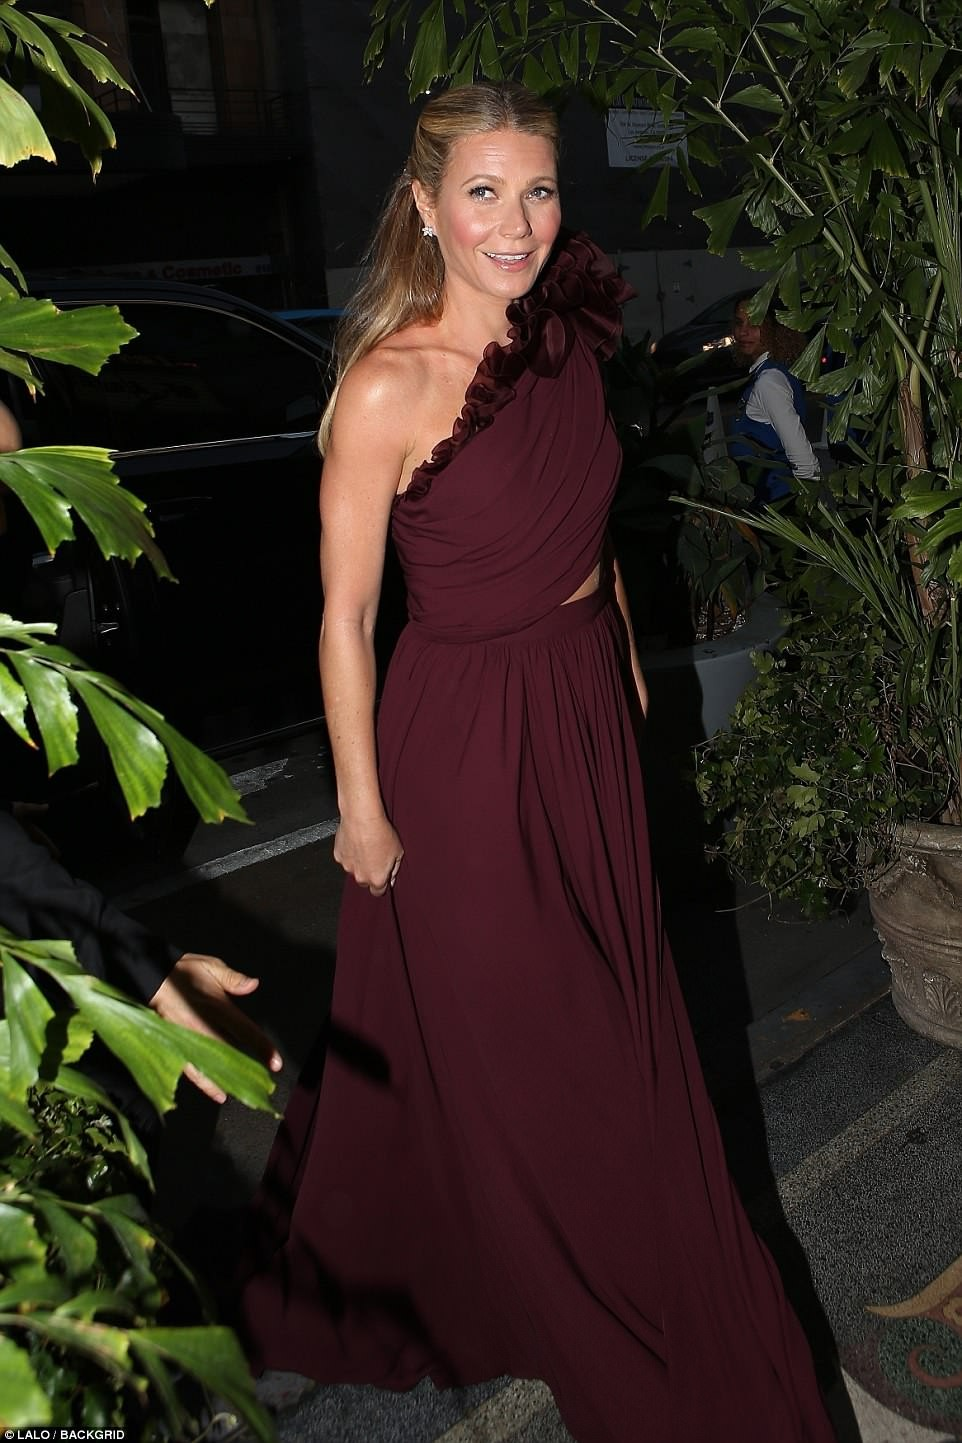 Actress Gwyneth Paltrow and Brad Falchuk hold \'secret wedding\' in LA (Photos)